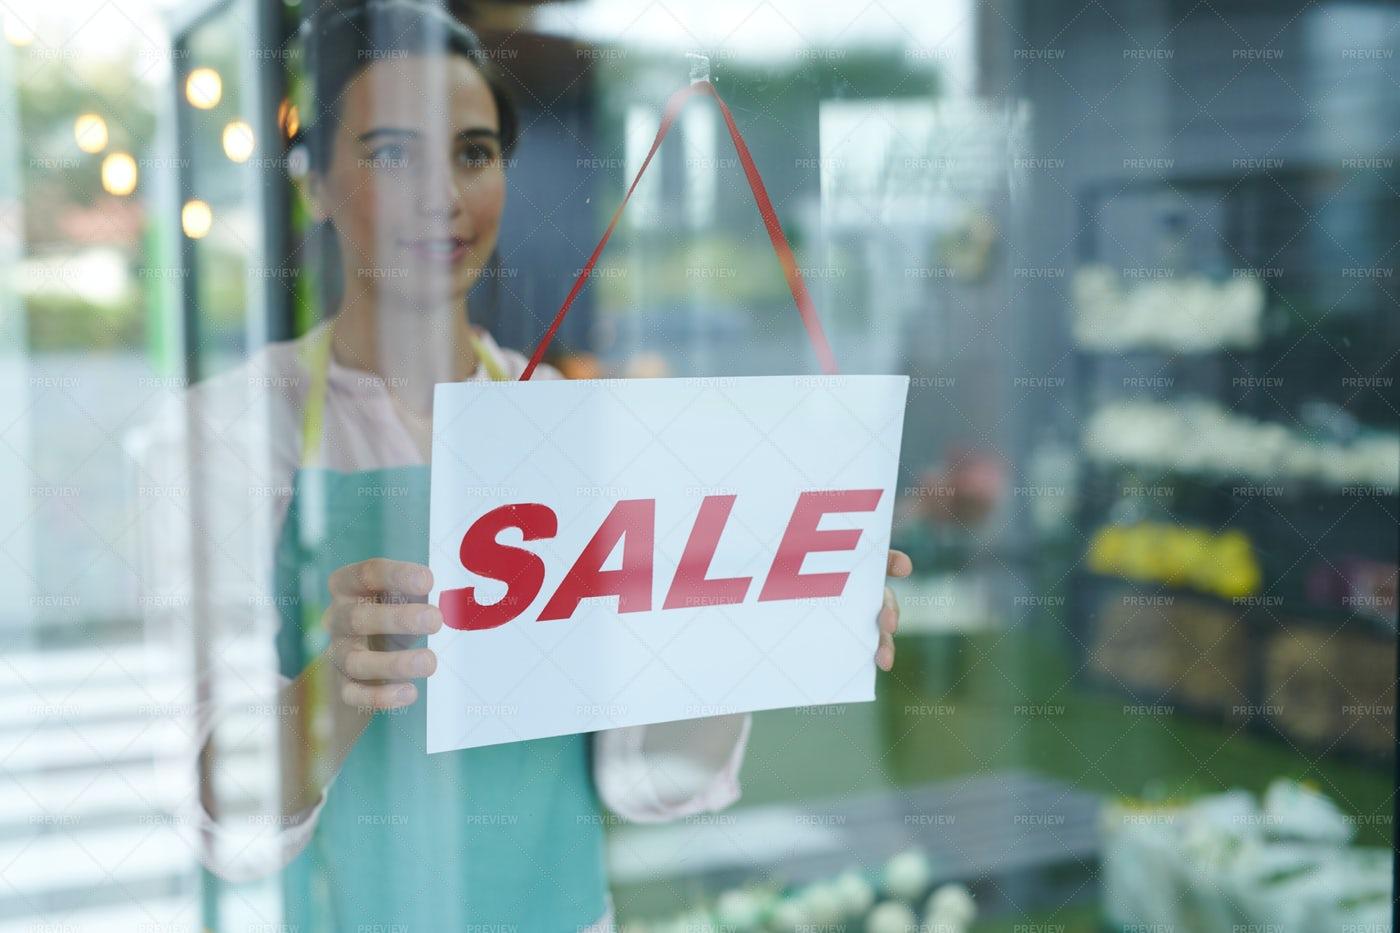 SALE Sign On Shop Window: Stock Photos